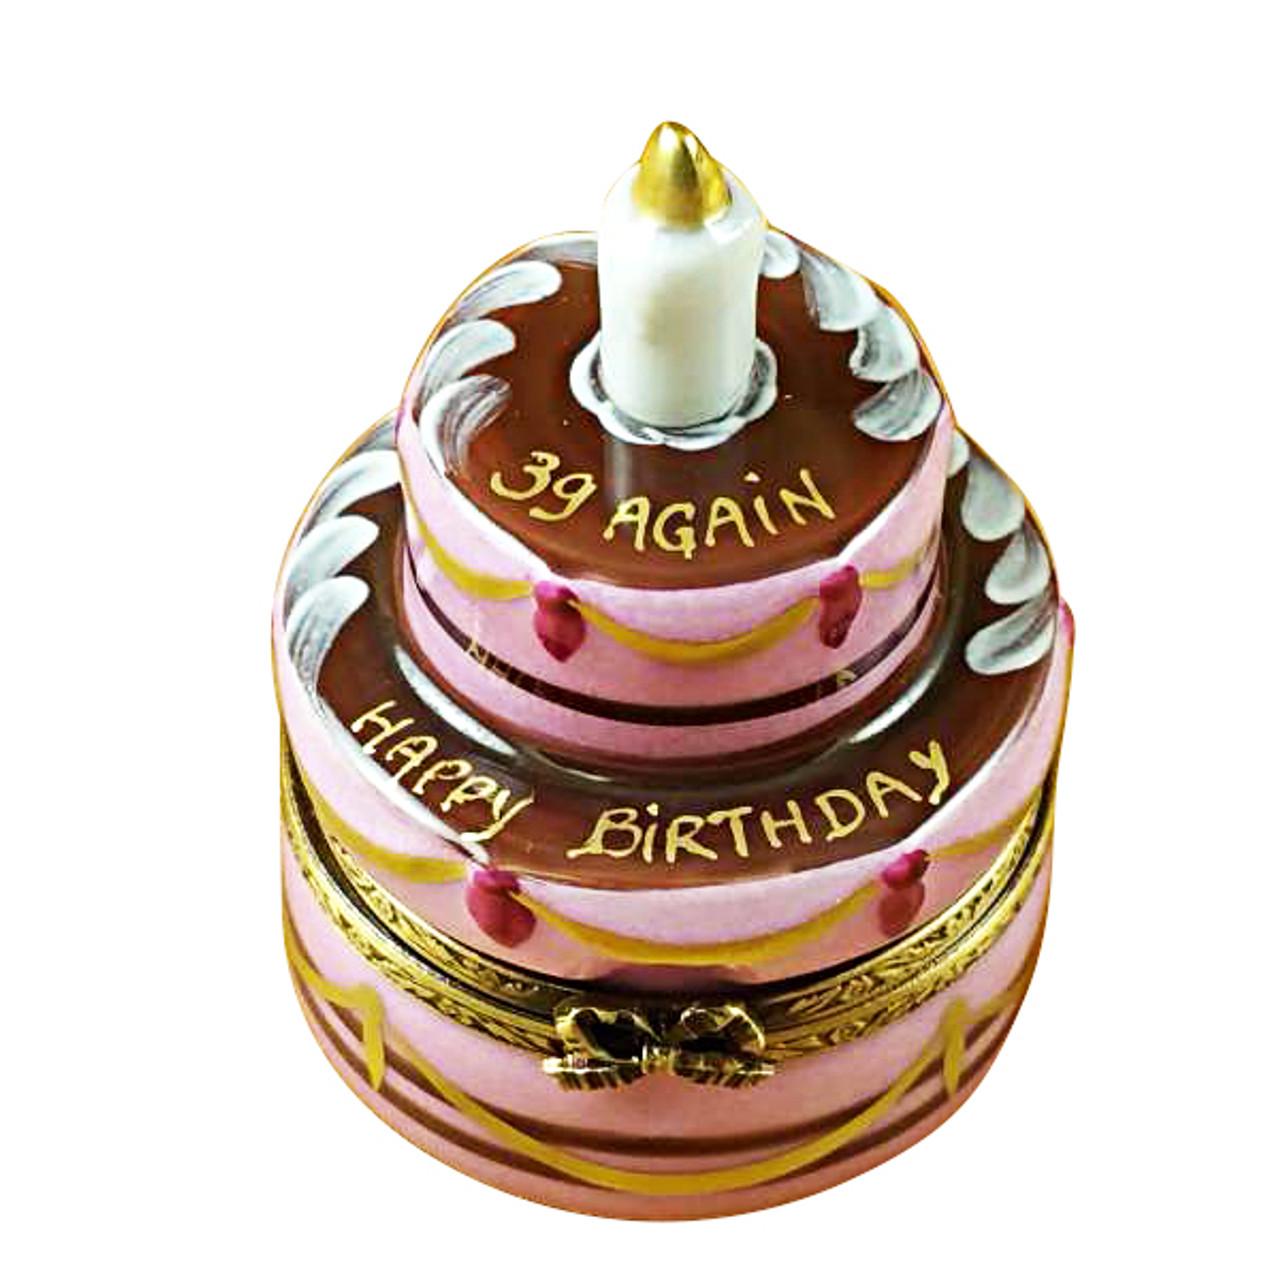 Limoges Imports Birthday Cake - '39 Again' Limoges Box